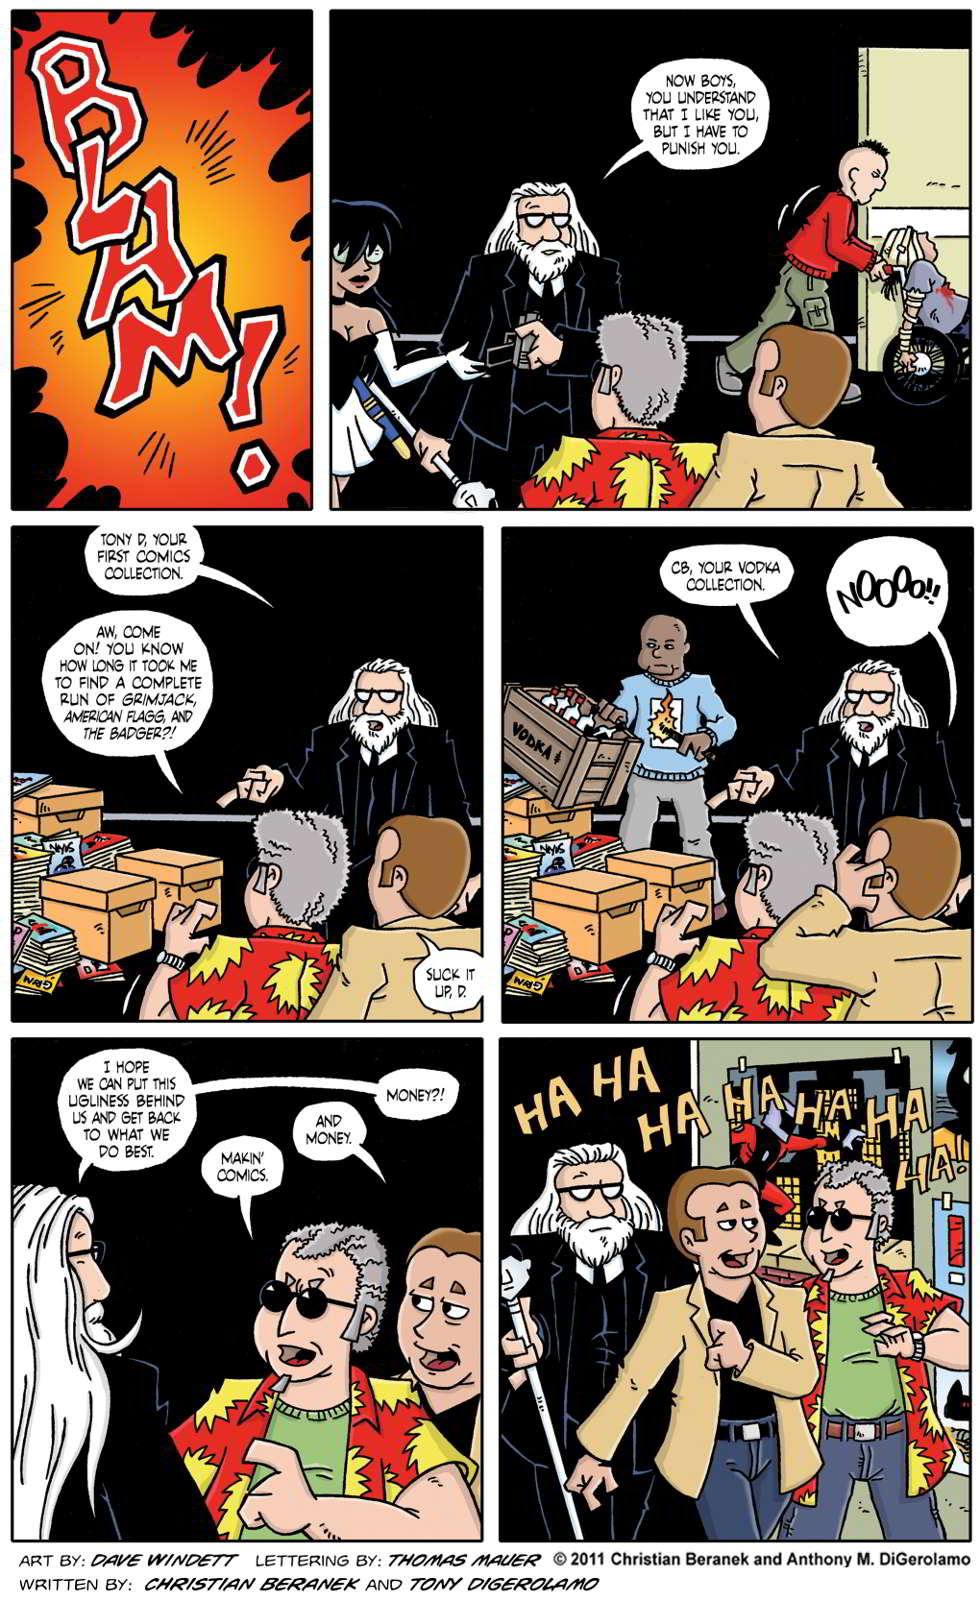 Comic Book Mafia #64:  Retribution